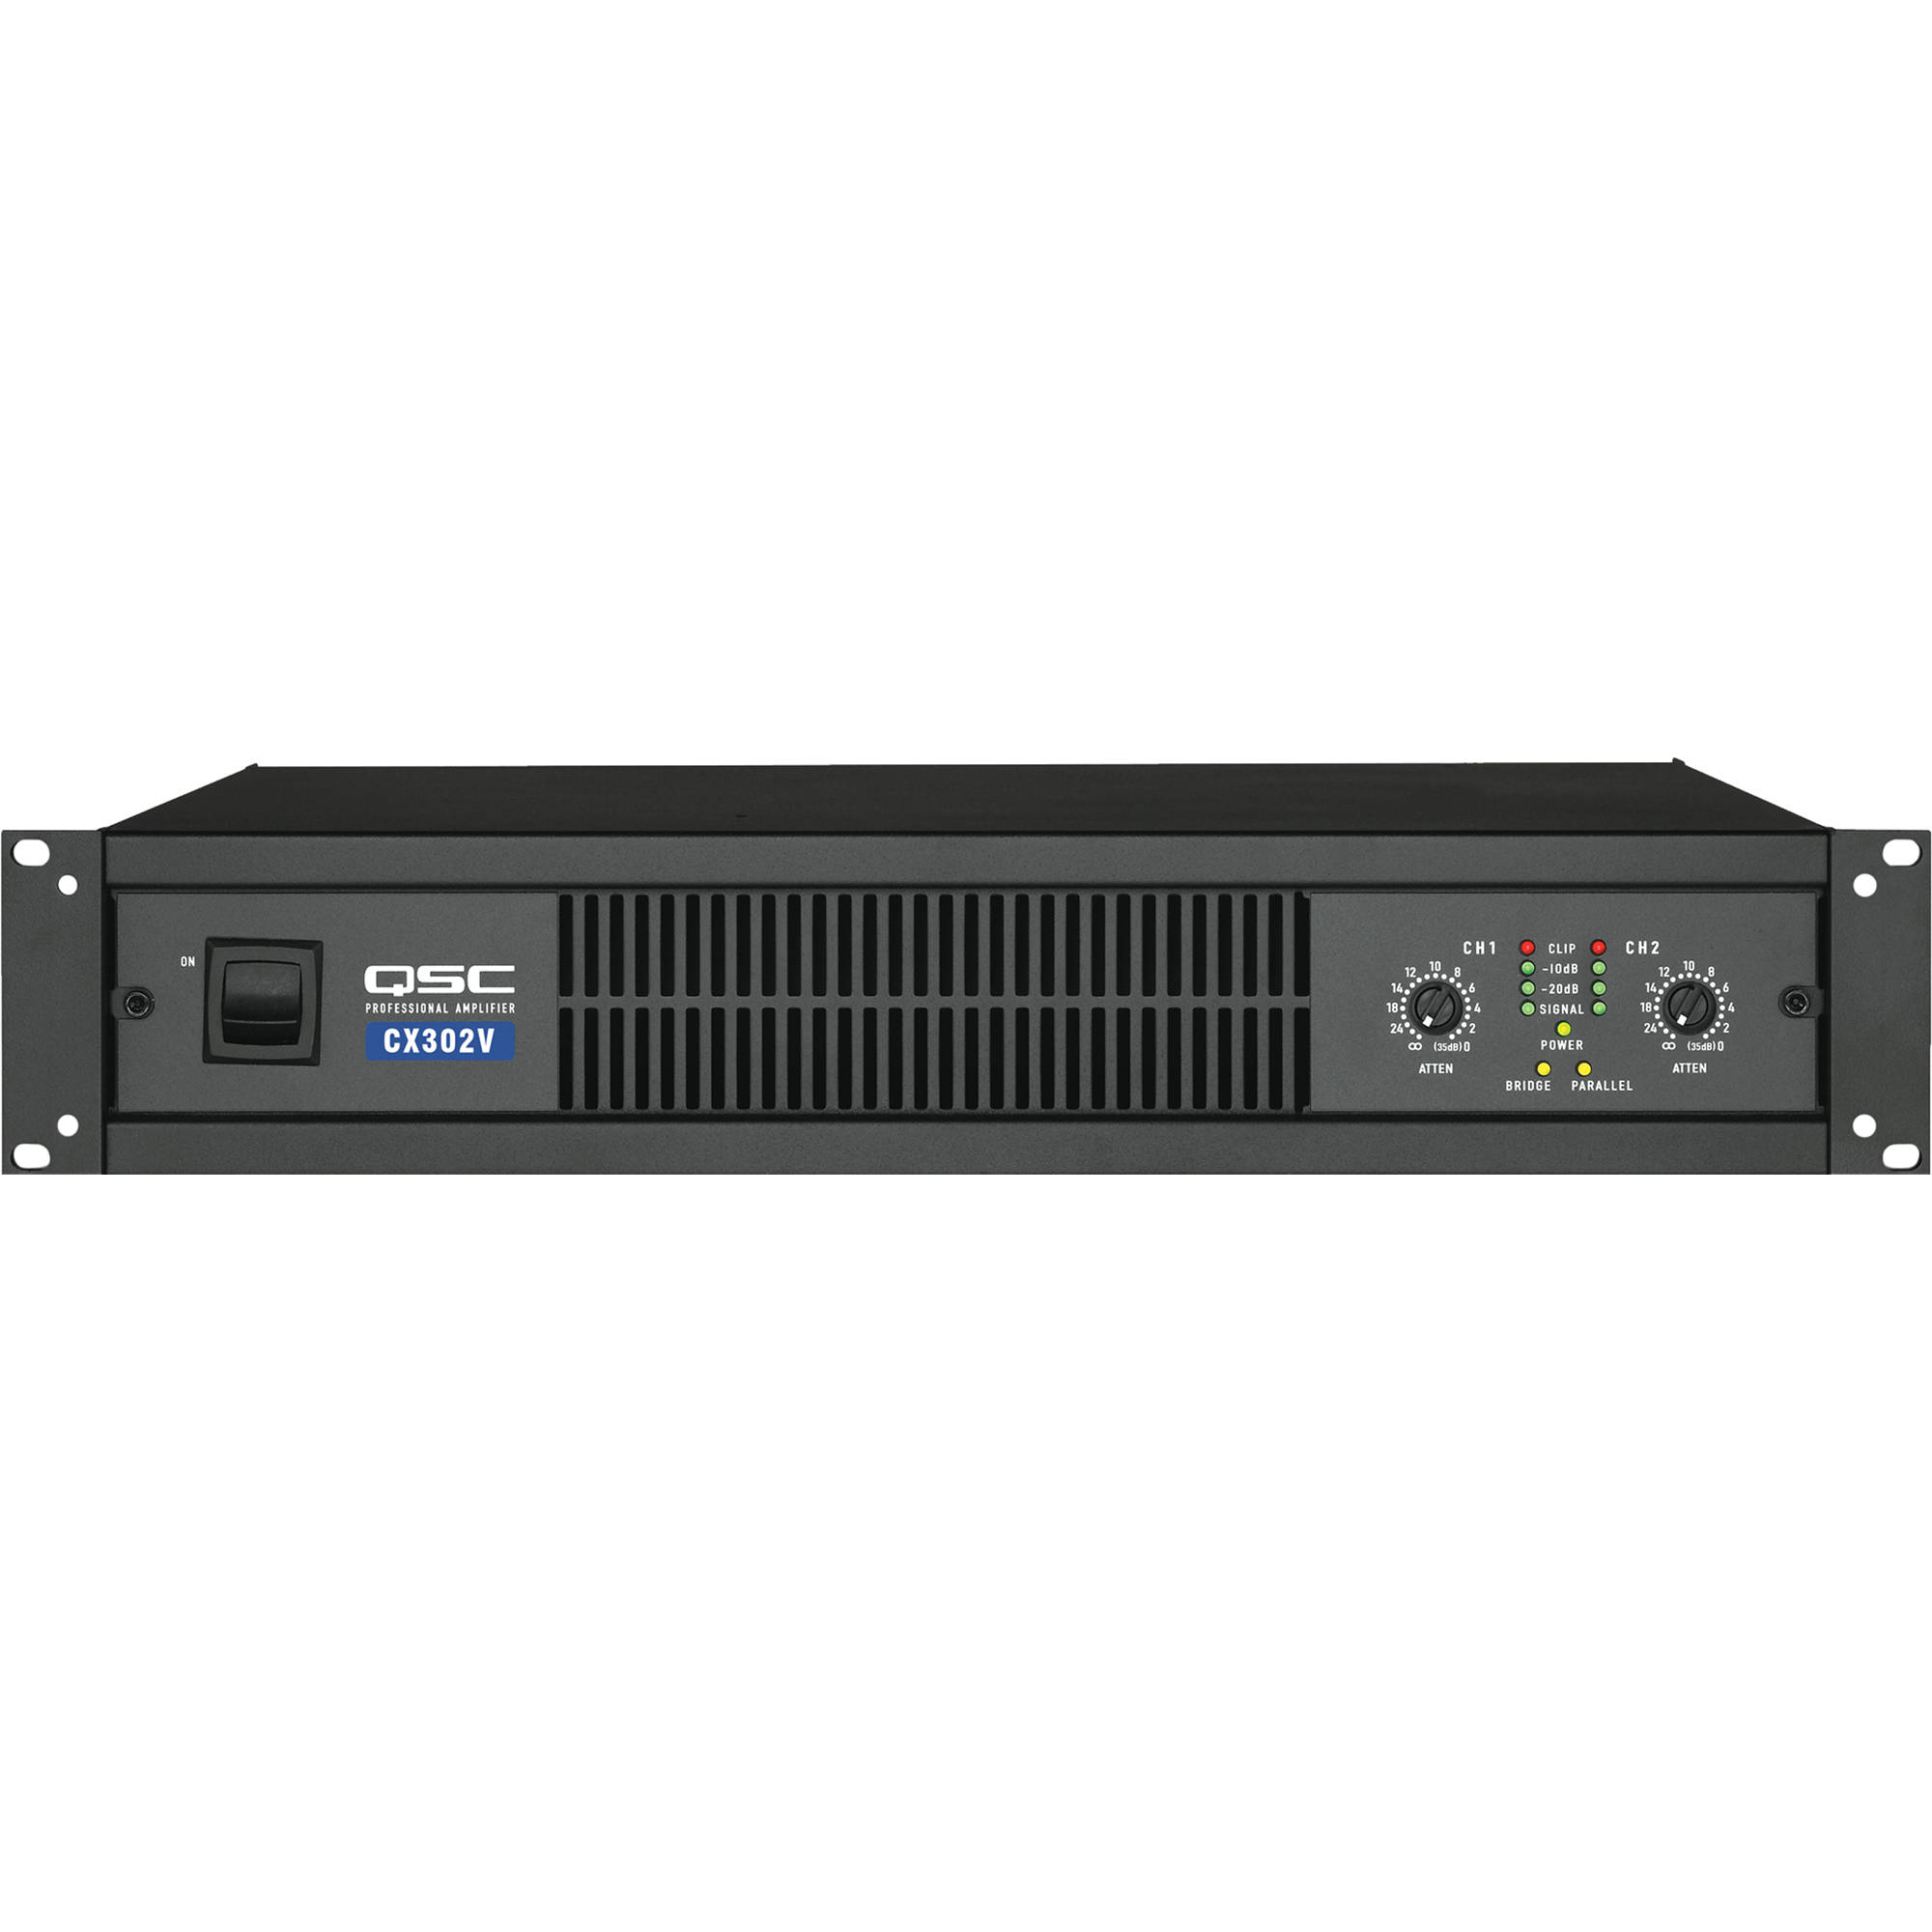 QSC CX-302V 2 Channel Direct Output Power Amplifier (300W, 70V)